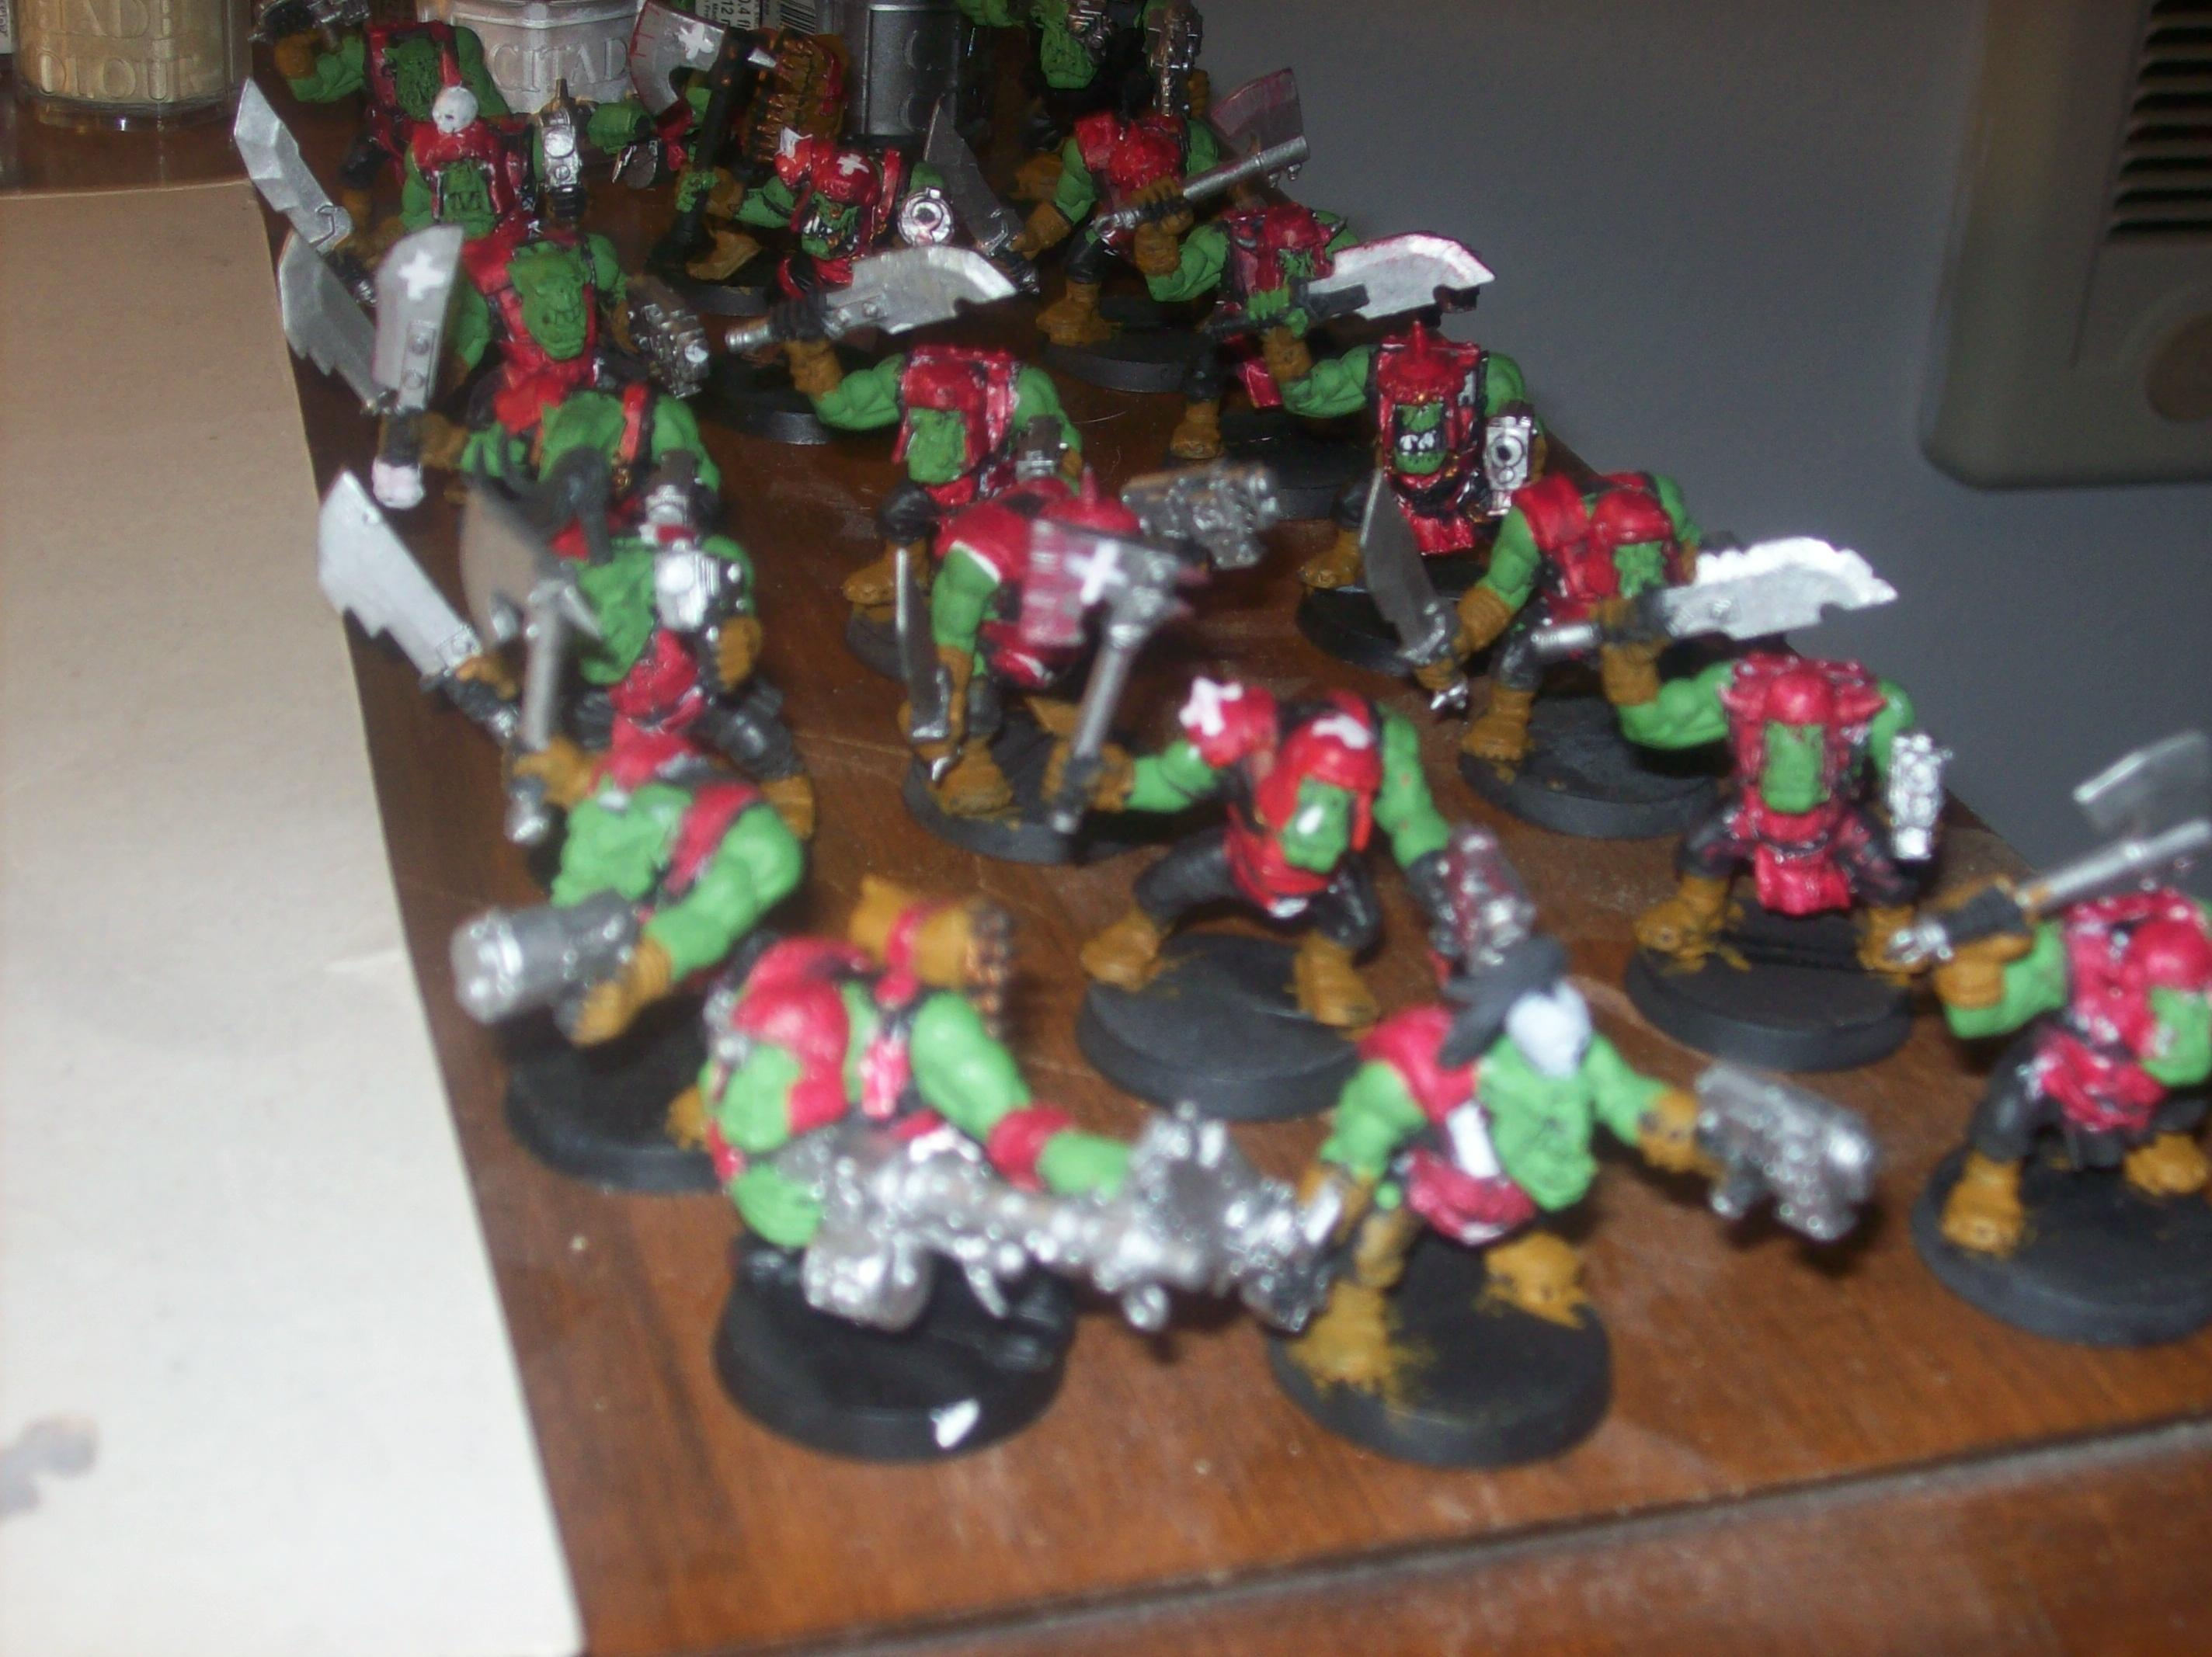 Ork Wip, My first Ork army